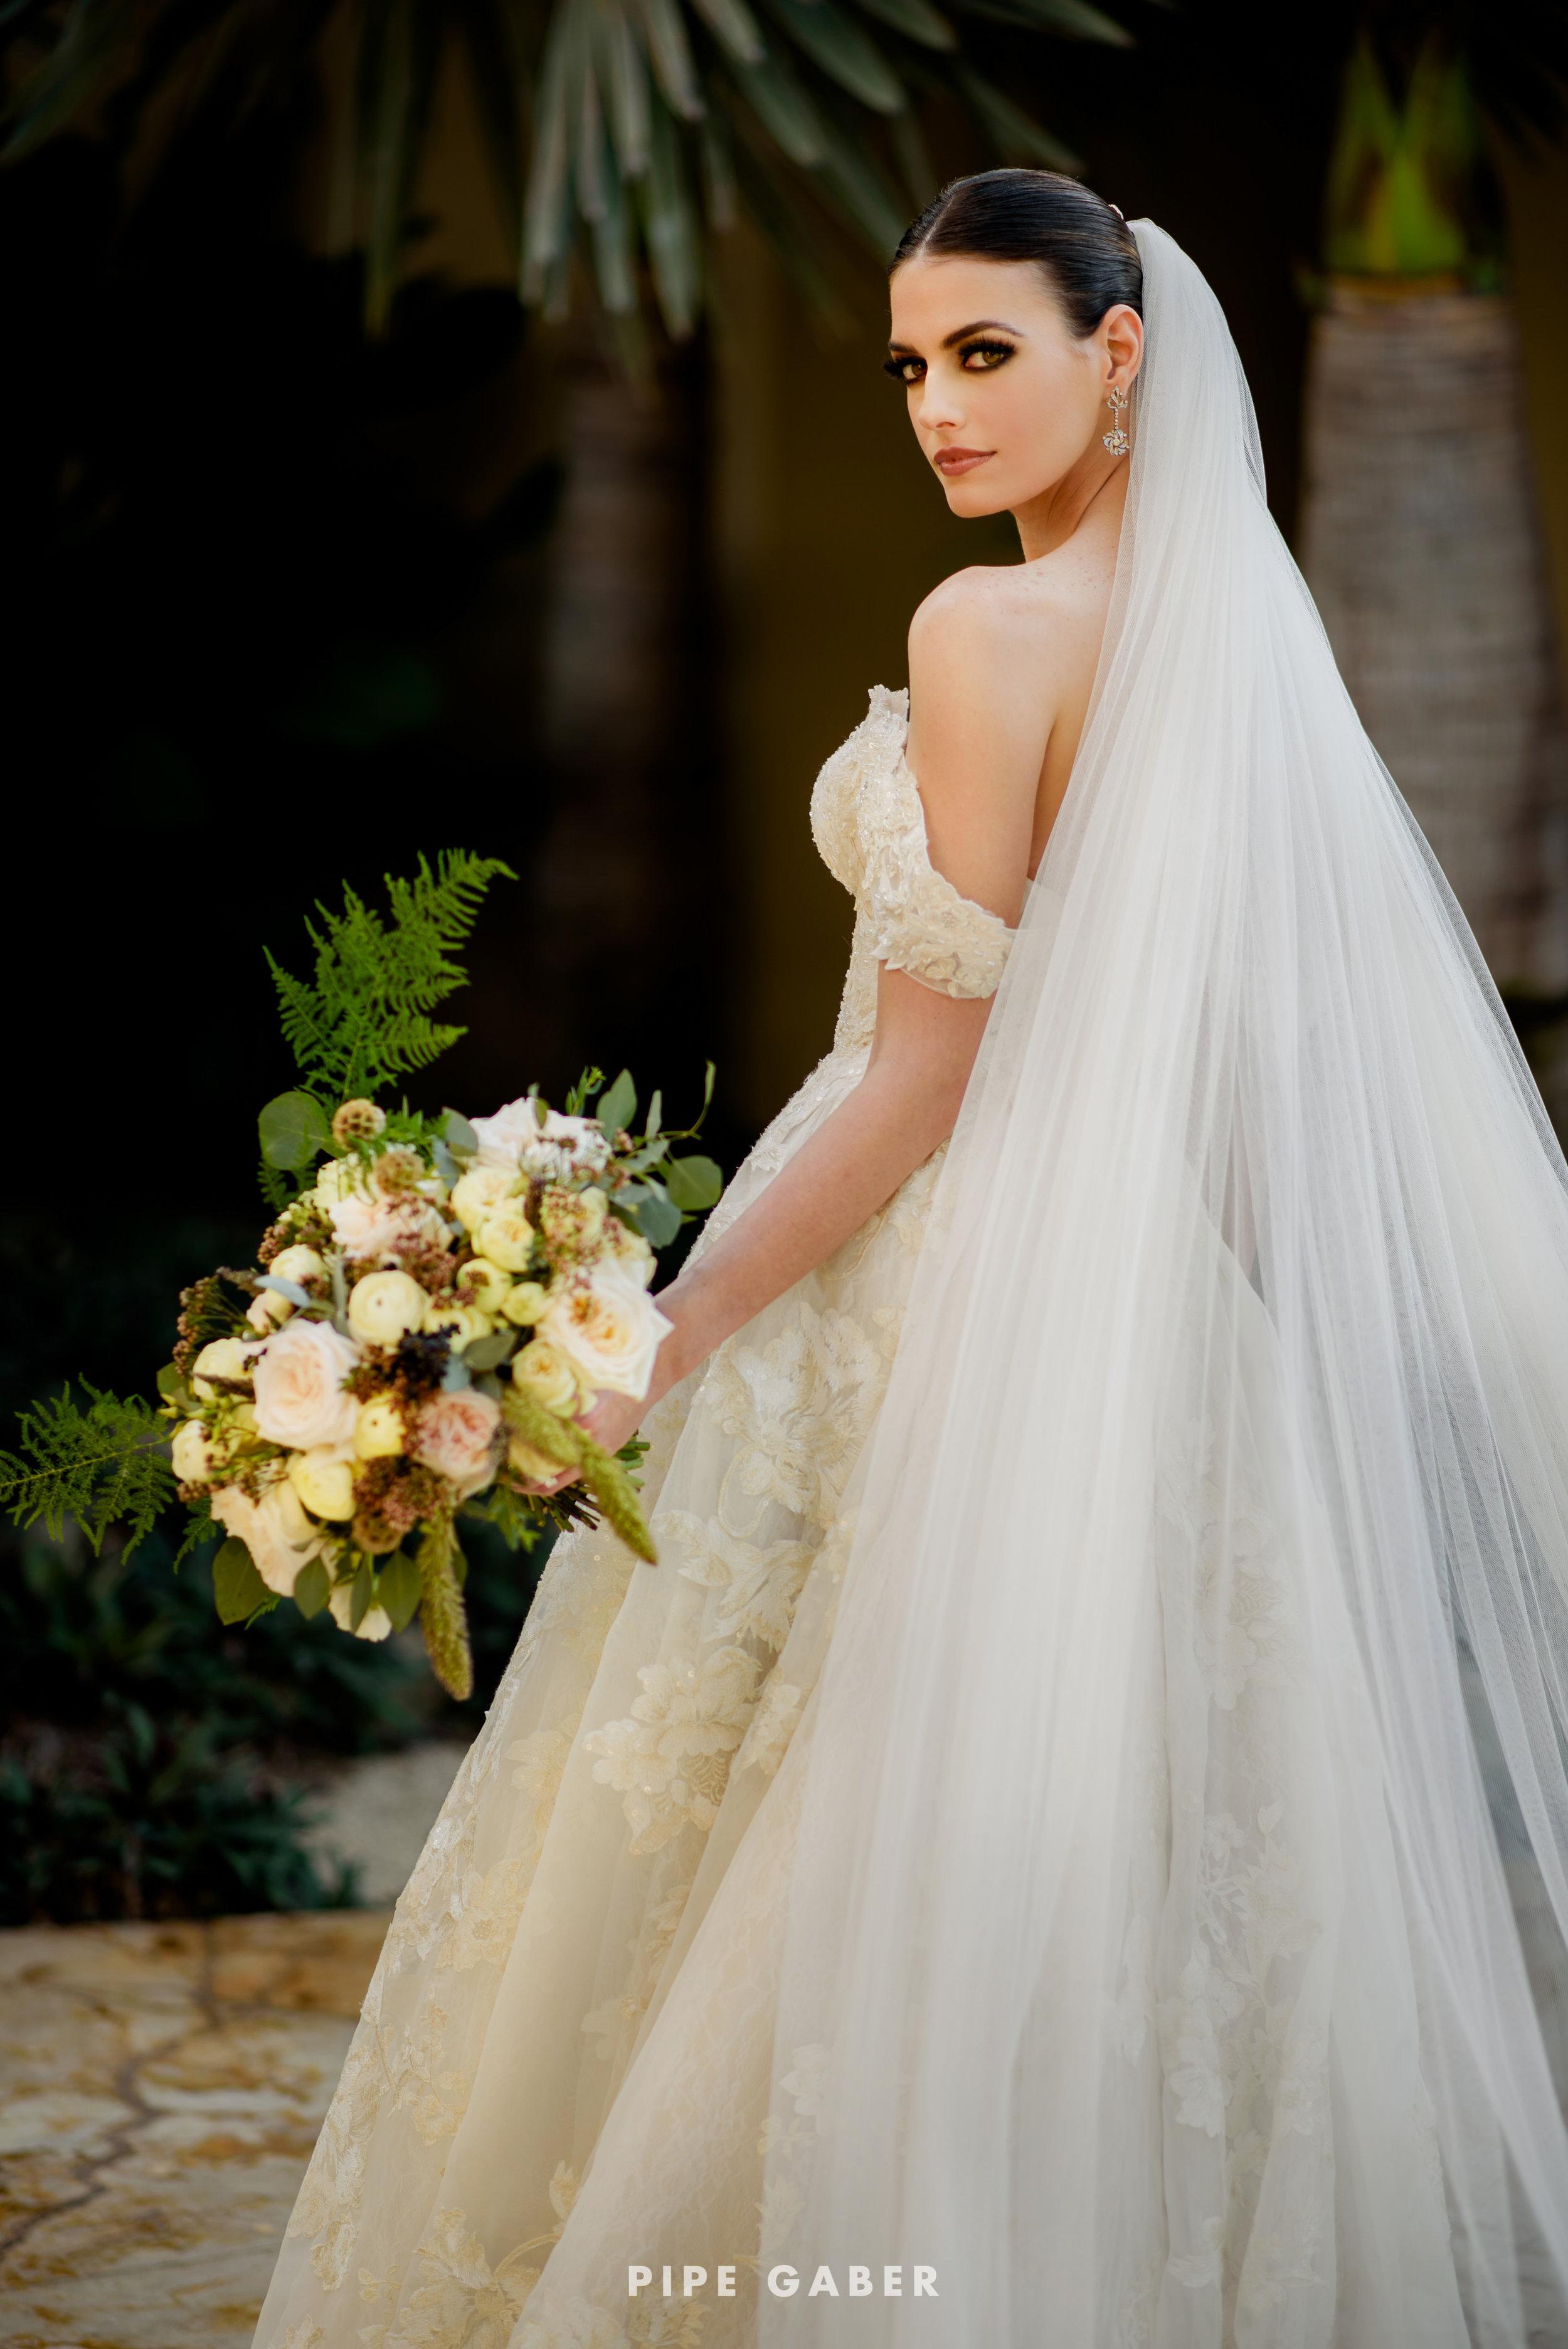 18_02_03_WEDDING_ALEXIS_ABIMERHI_ERICK_APT_0324.jpg